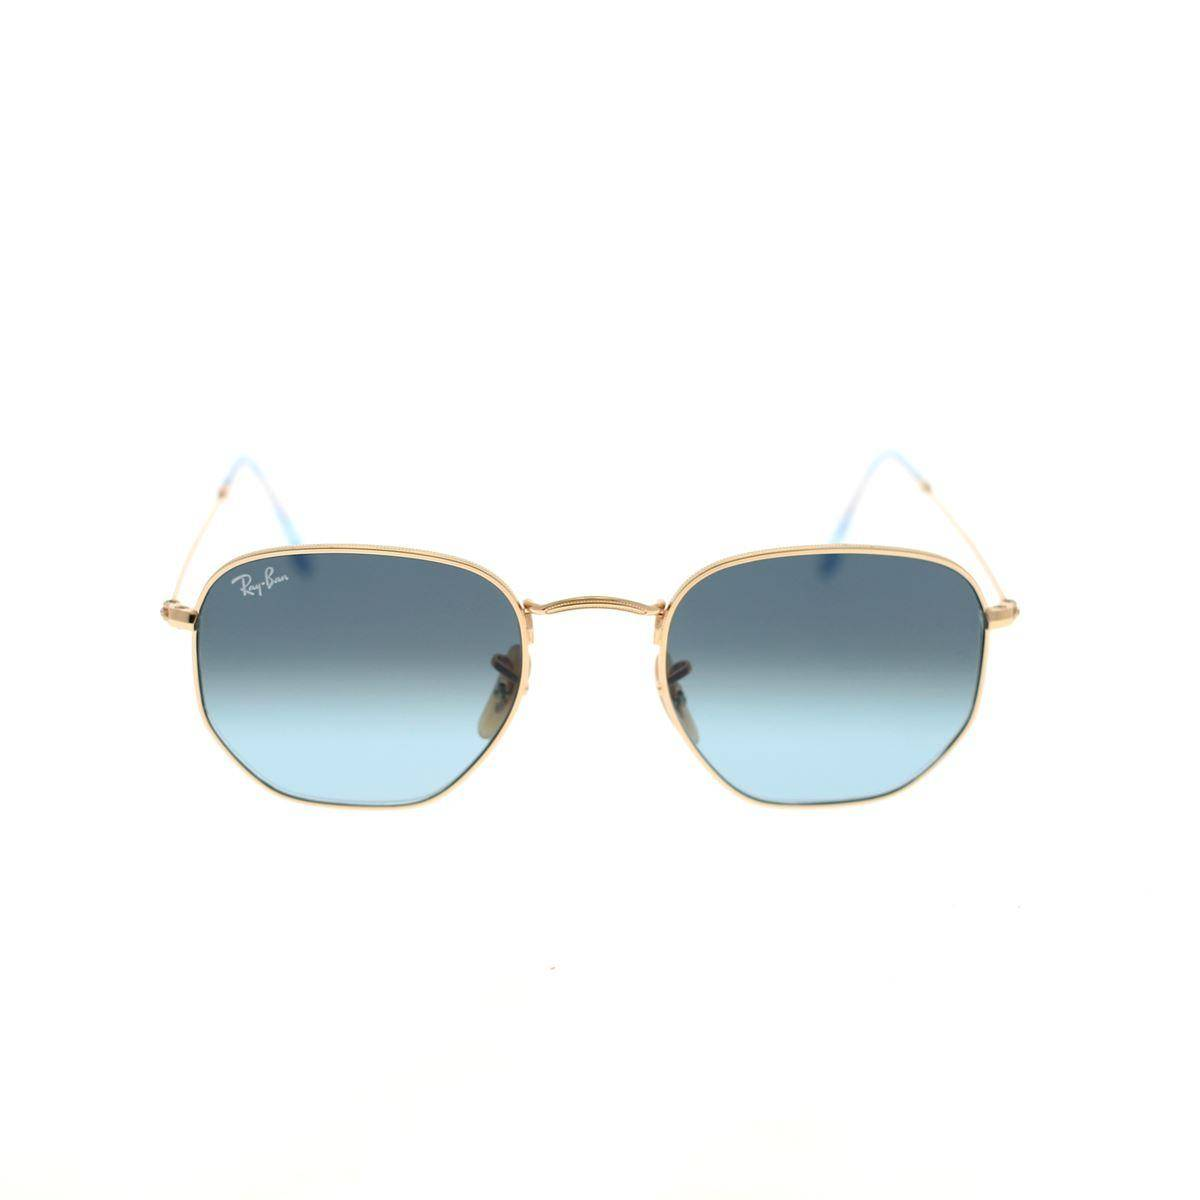 ray-ban occhiali da sole hexagonal rb3548n 91233m